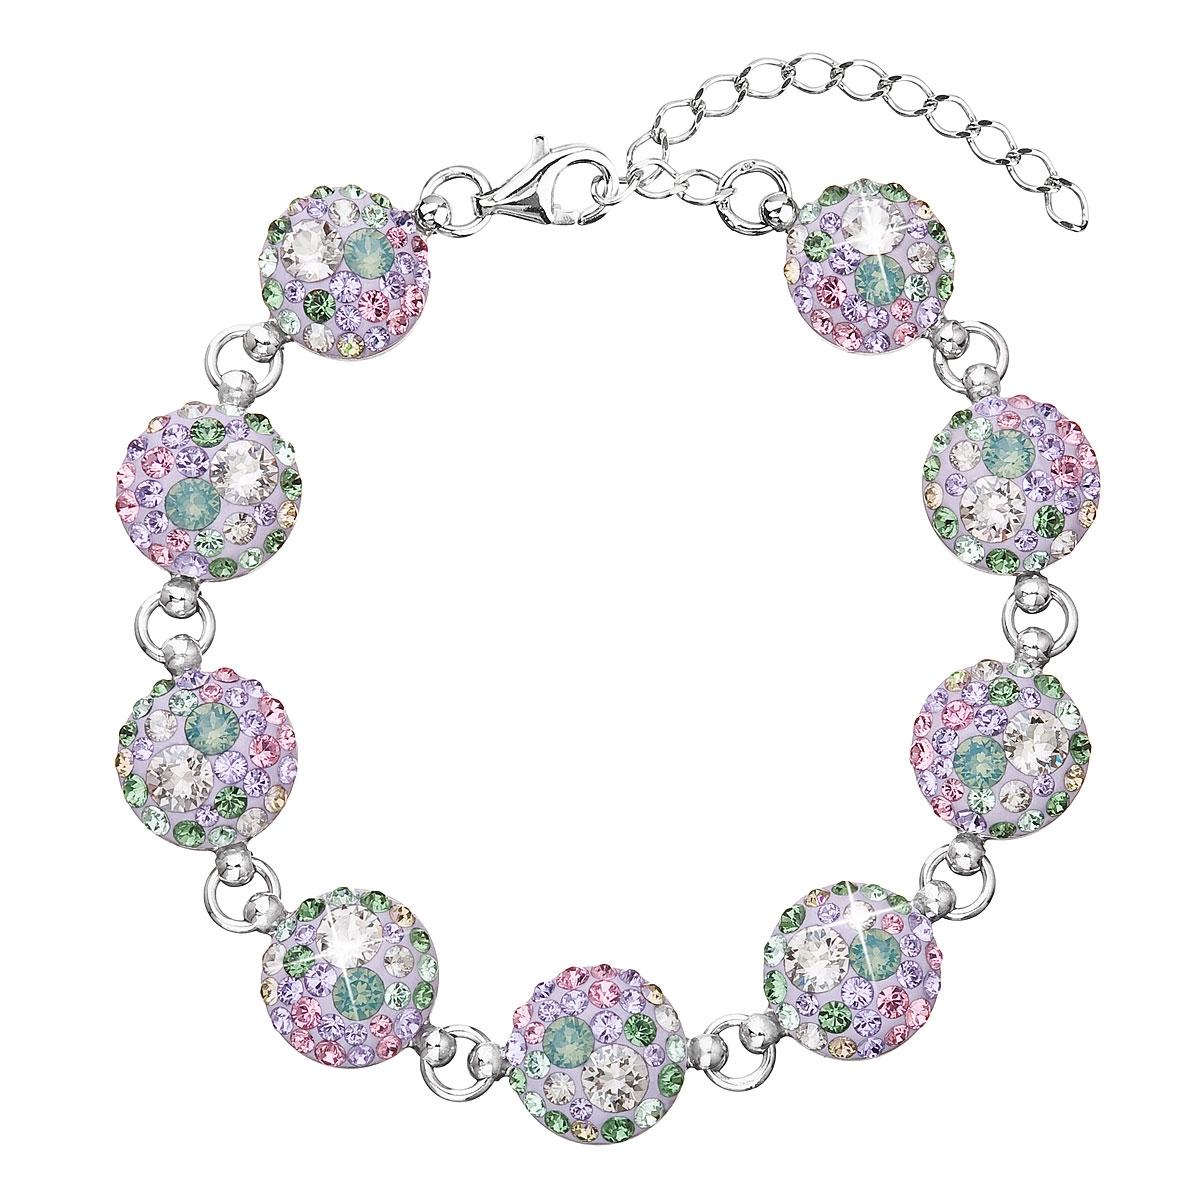 Stříbrný náramek s krystaly Crystals from Swarovski®, Sakura EG7004-SK